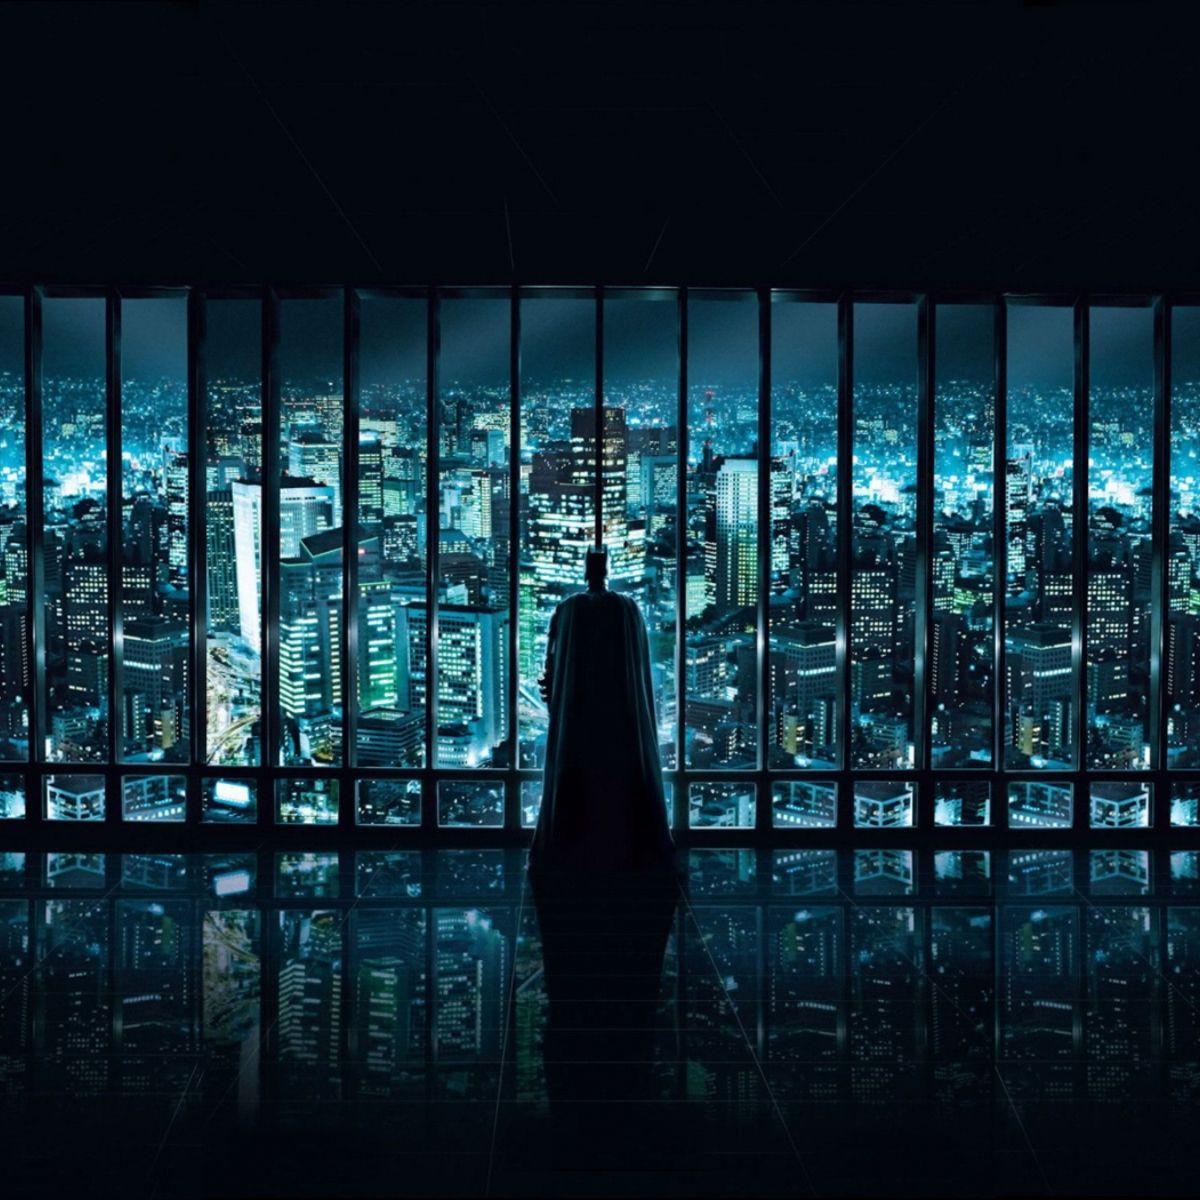 1492-batman-looking-at-gotham-city-wallpaper-wallchan-1440x1050.jpg